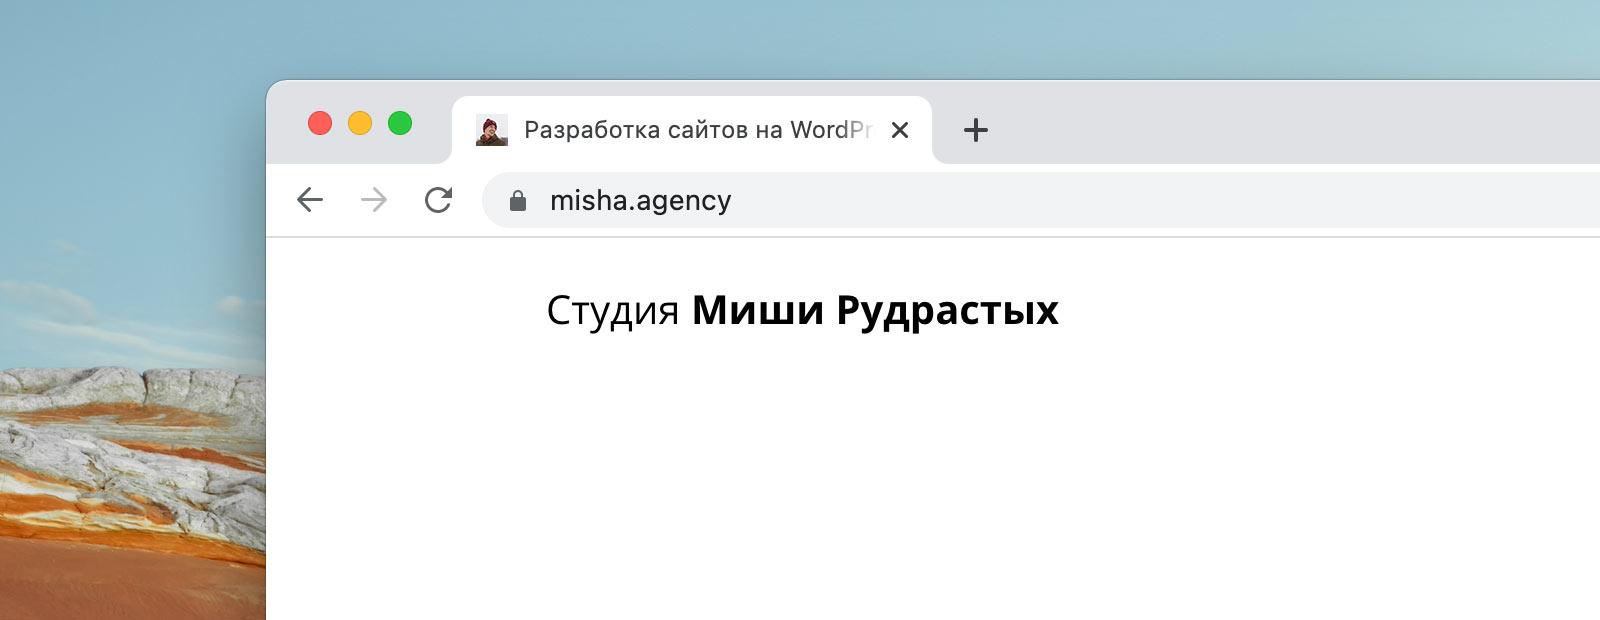 SSL-сертификат для домена misha.agency